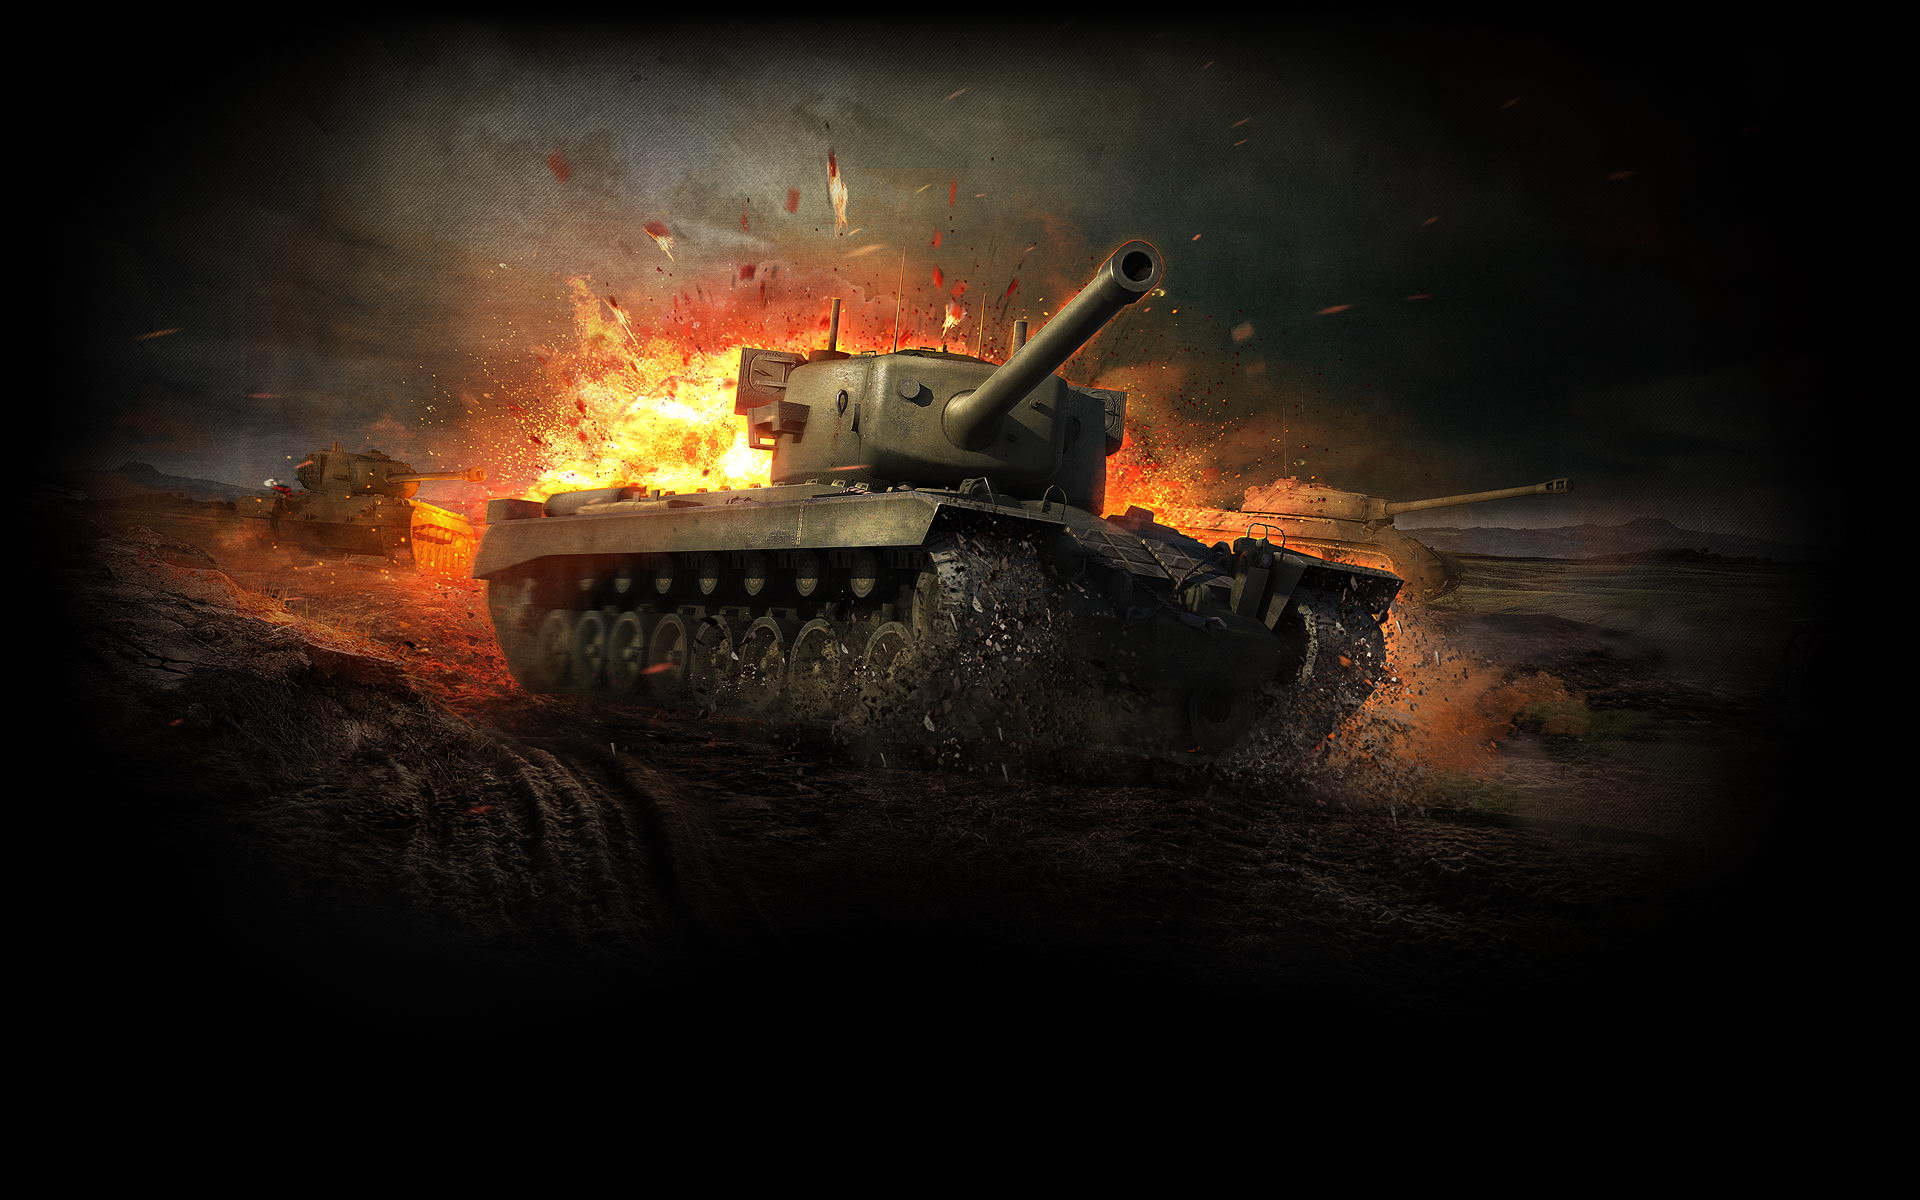 world-of-tanks.eu :: Nowe tła ekranu logowania: world-of-tanks.eu/aktualnosci/-506--nowe-tla-ekranu-logowania